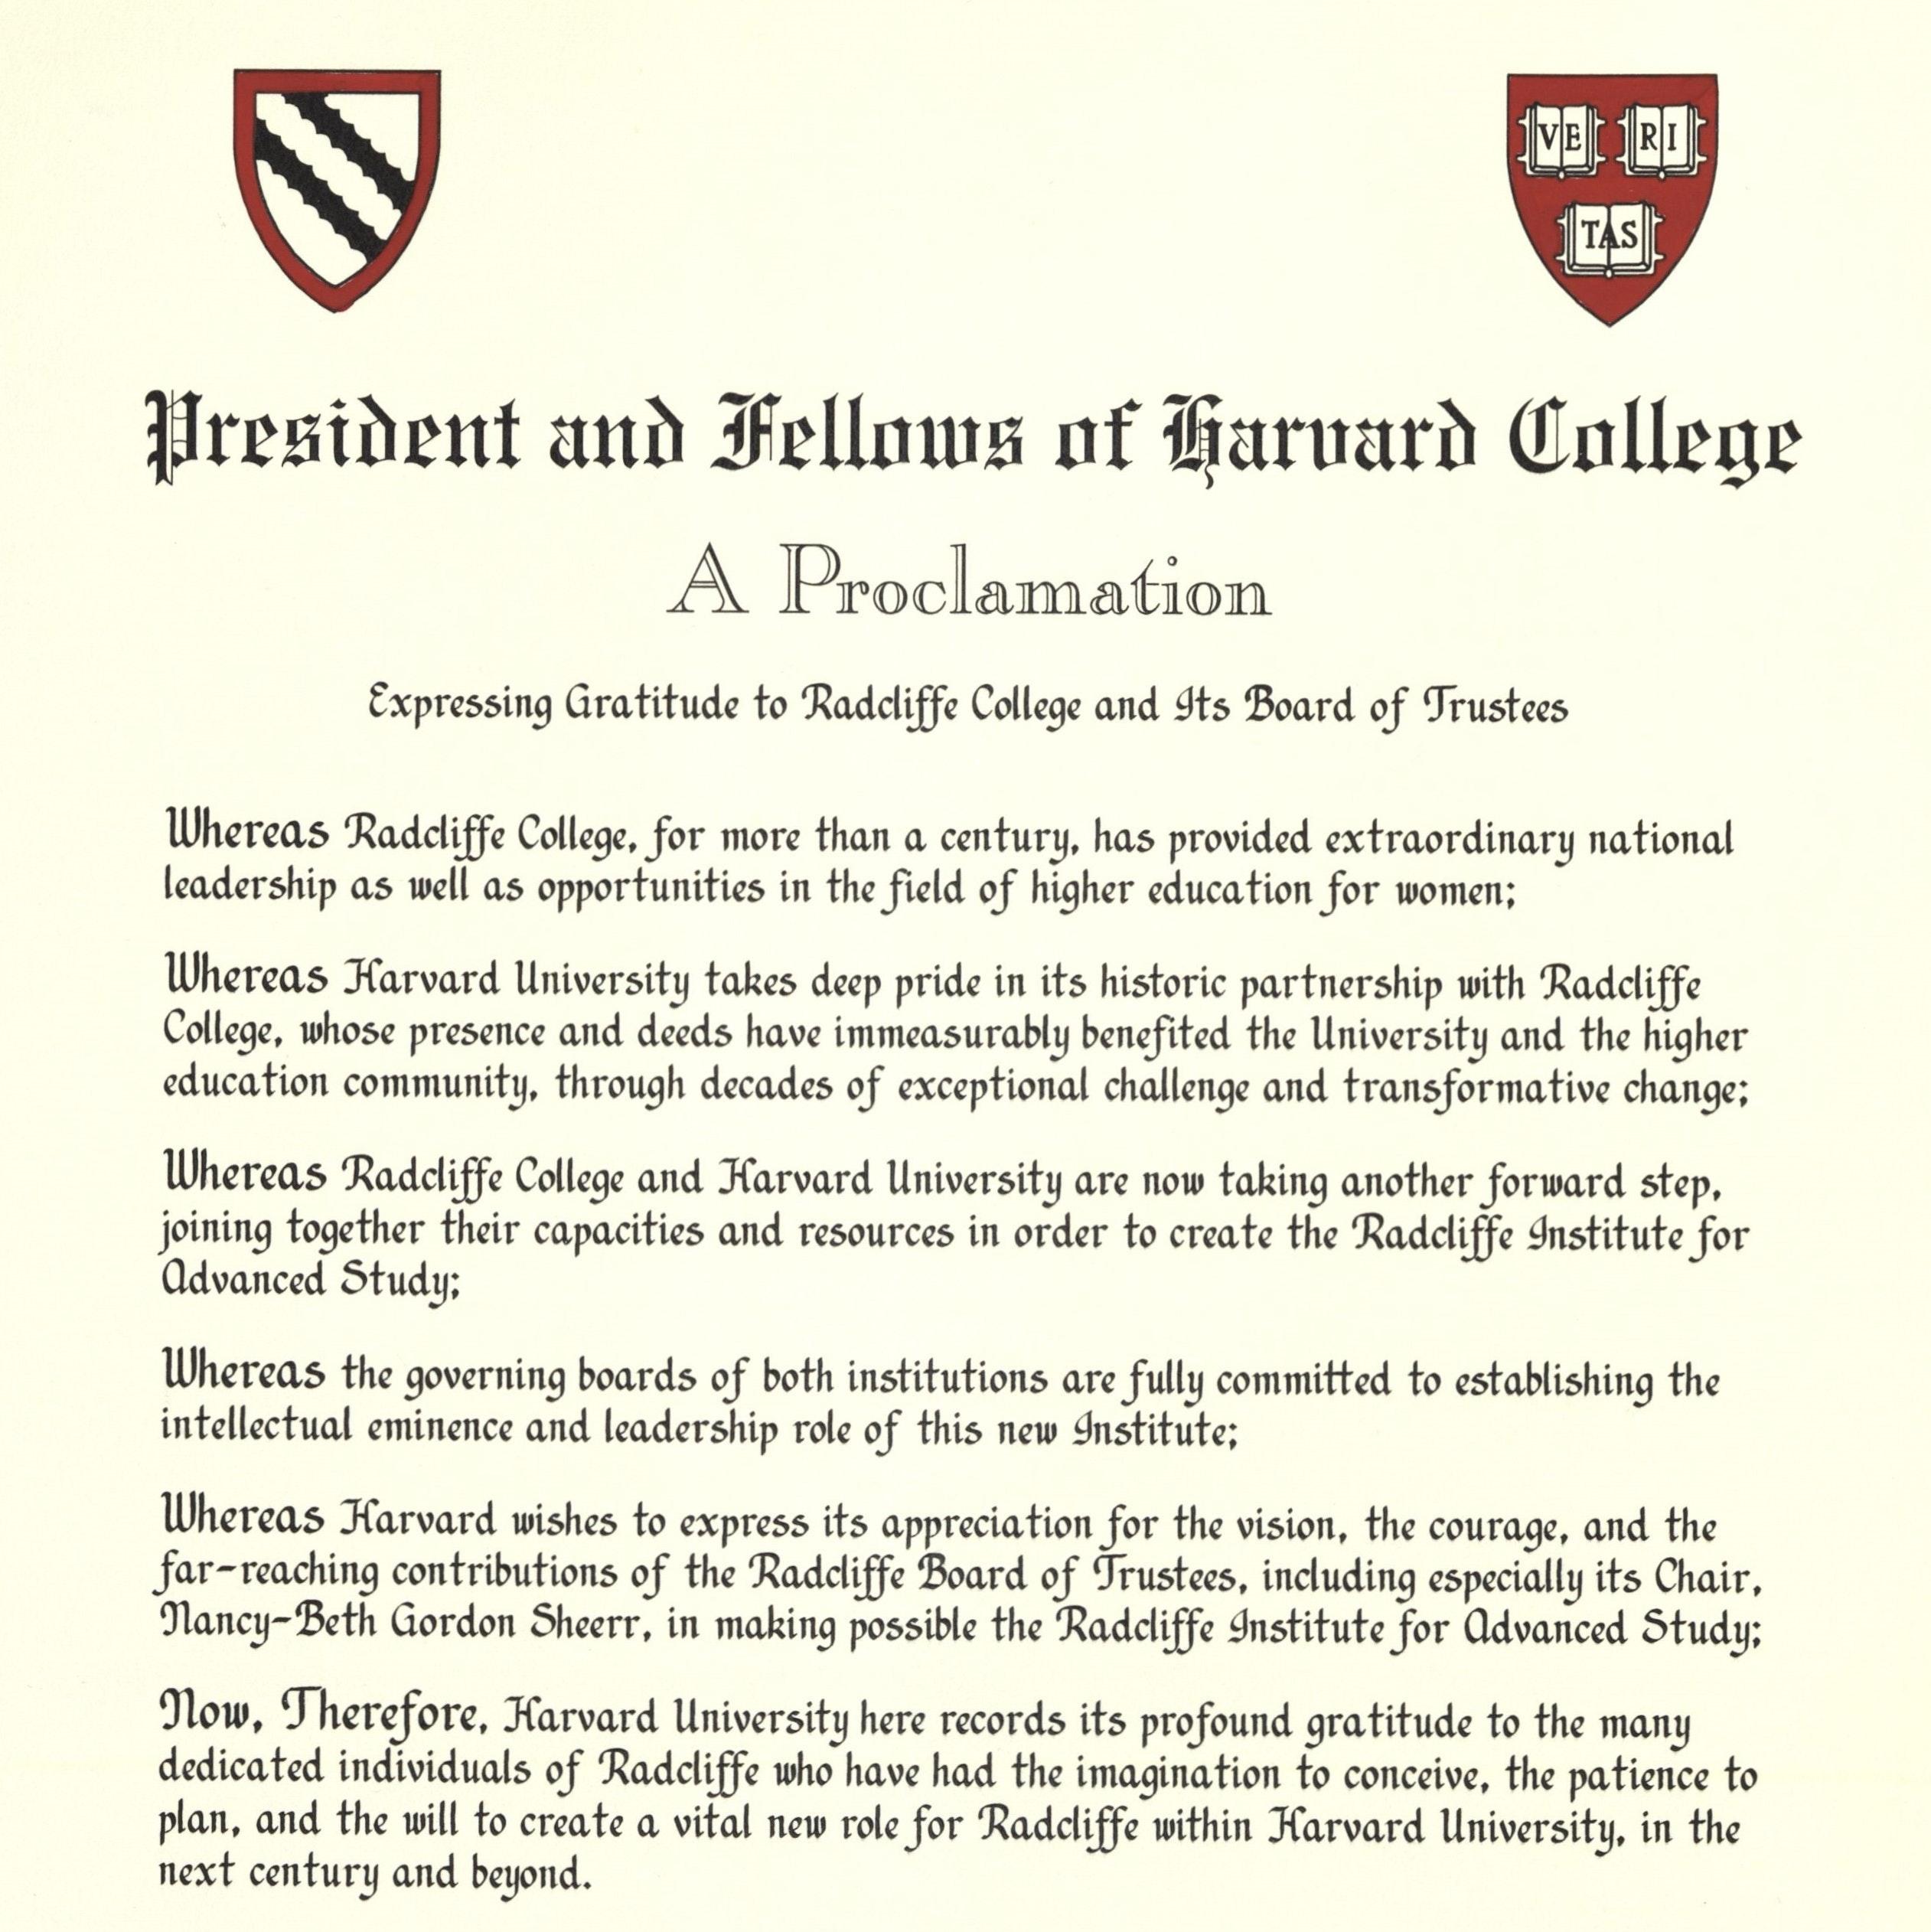 Harvard College Proclamation